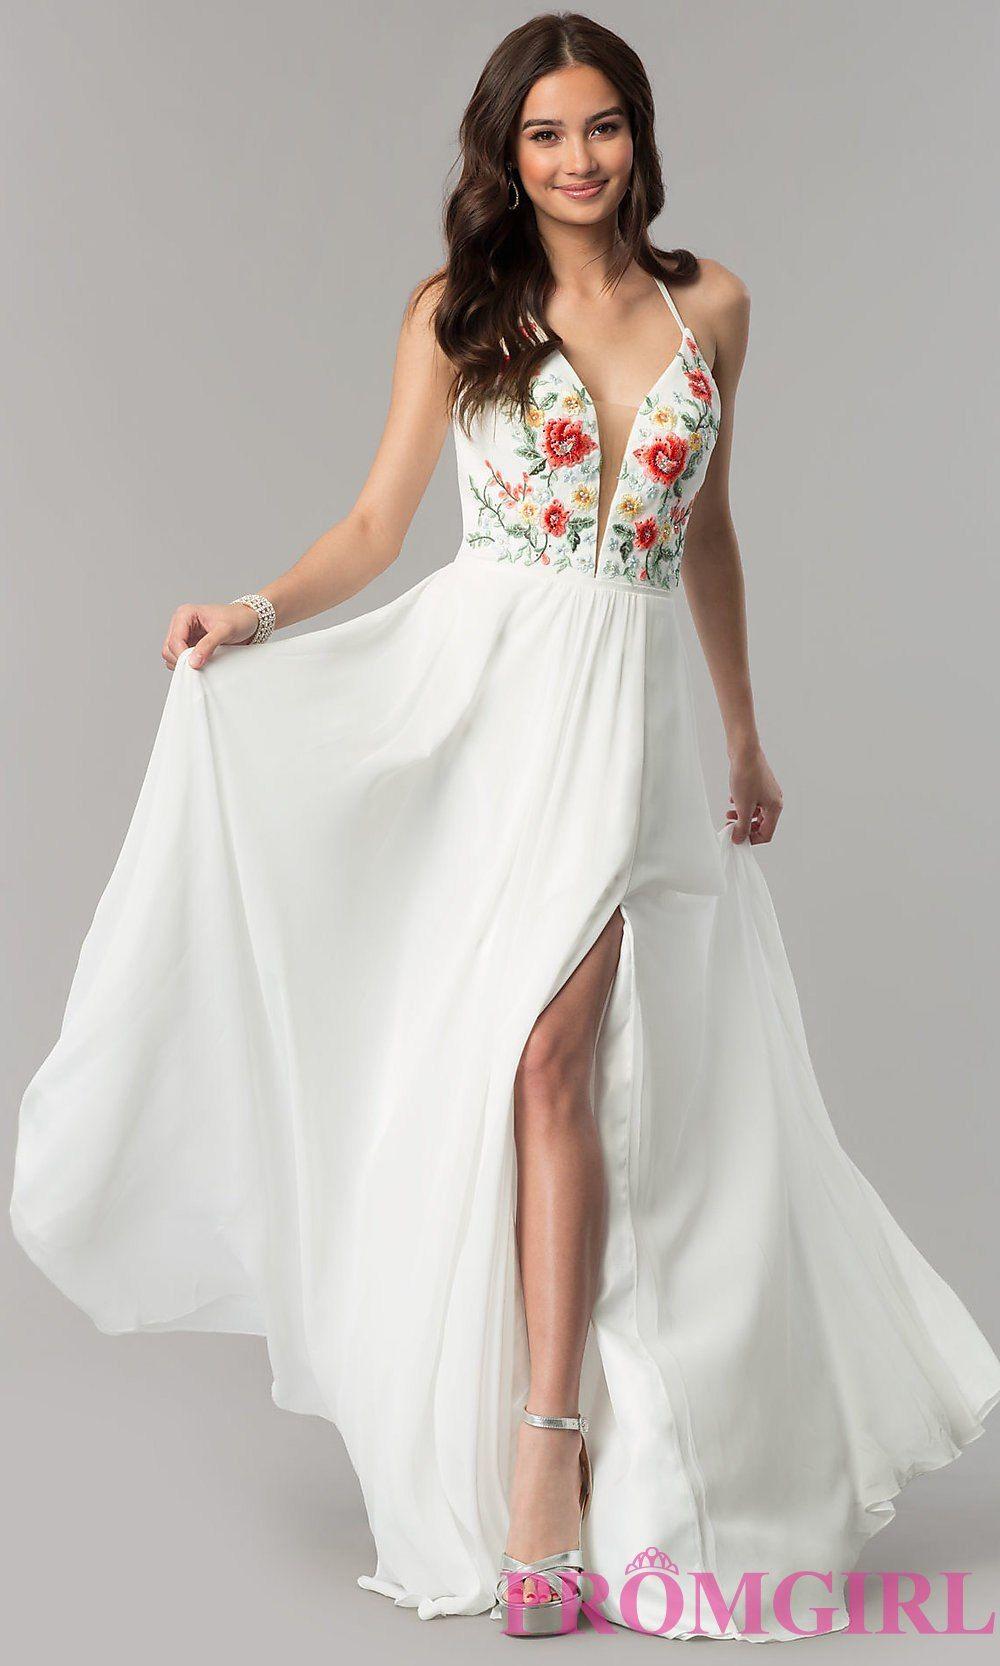 I like Style FA-10000 from PromGirl.com, do you like? | Prom dresses ...